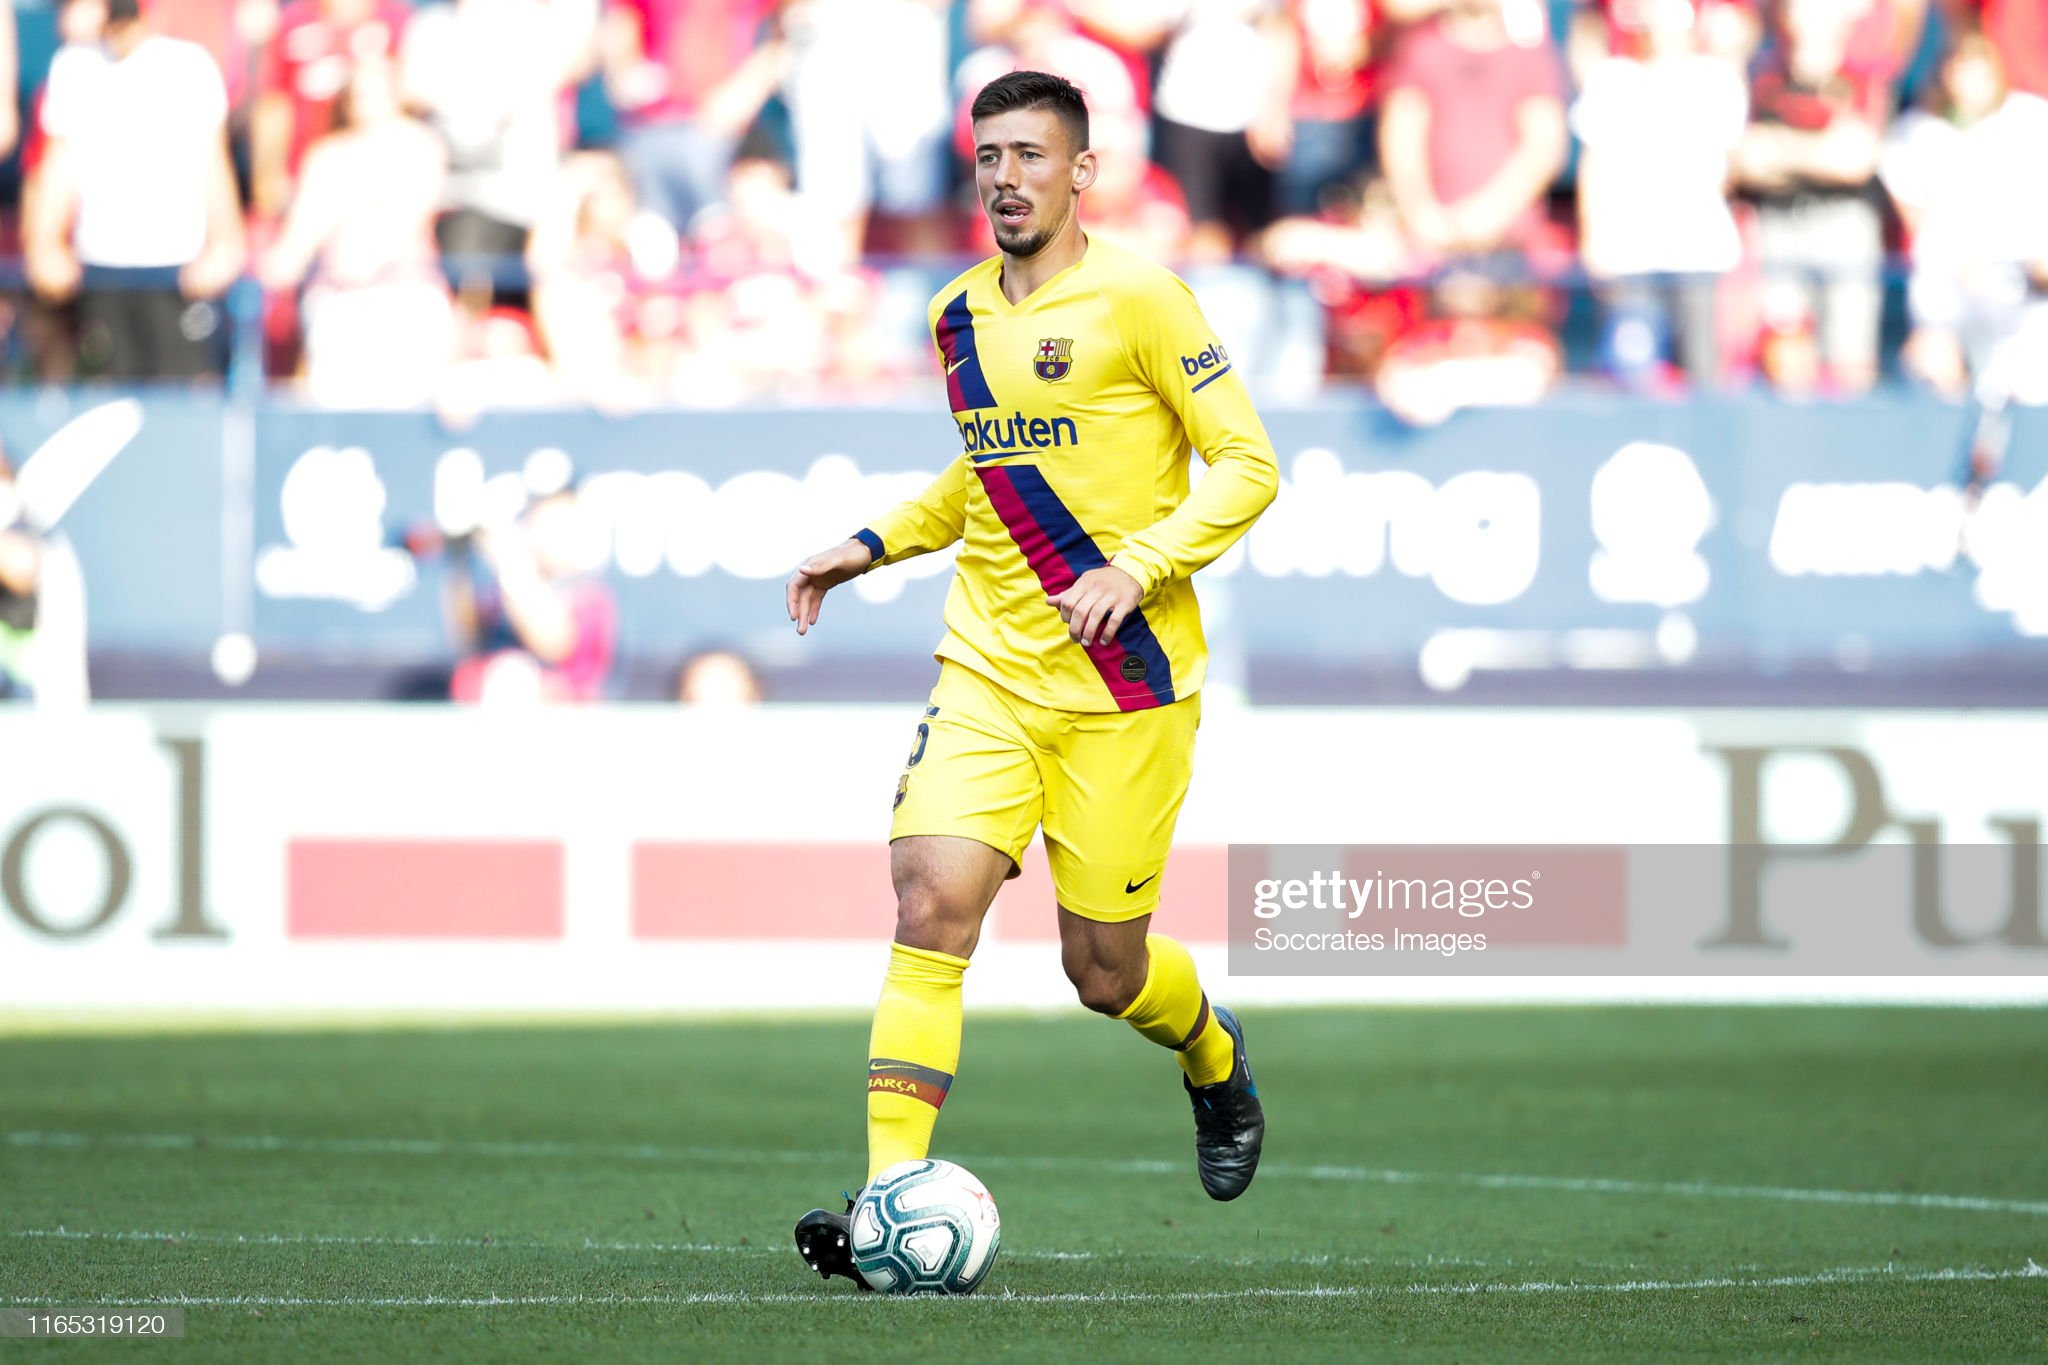 صور مباراة : أوساسونا - برشلونة 2-2 ( 31-08-2019 )  Clement-lenglet-of-fc-barcelona-during-the-la-liga-santander-match-picture-id1165319120?s=2048x2048